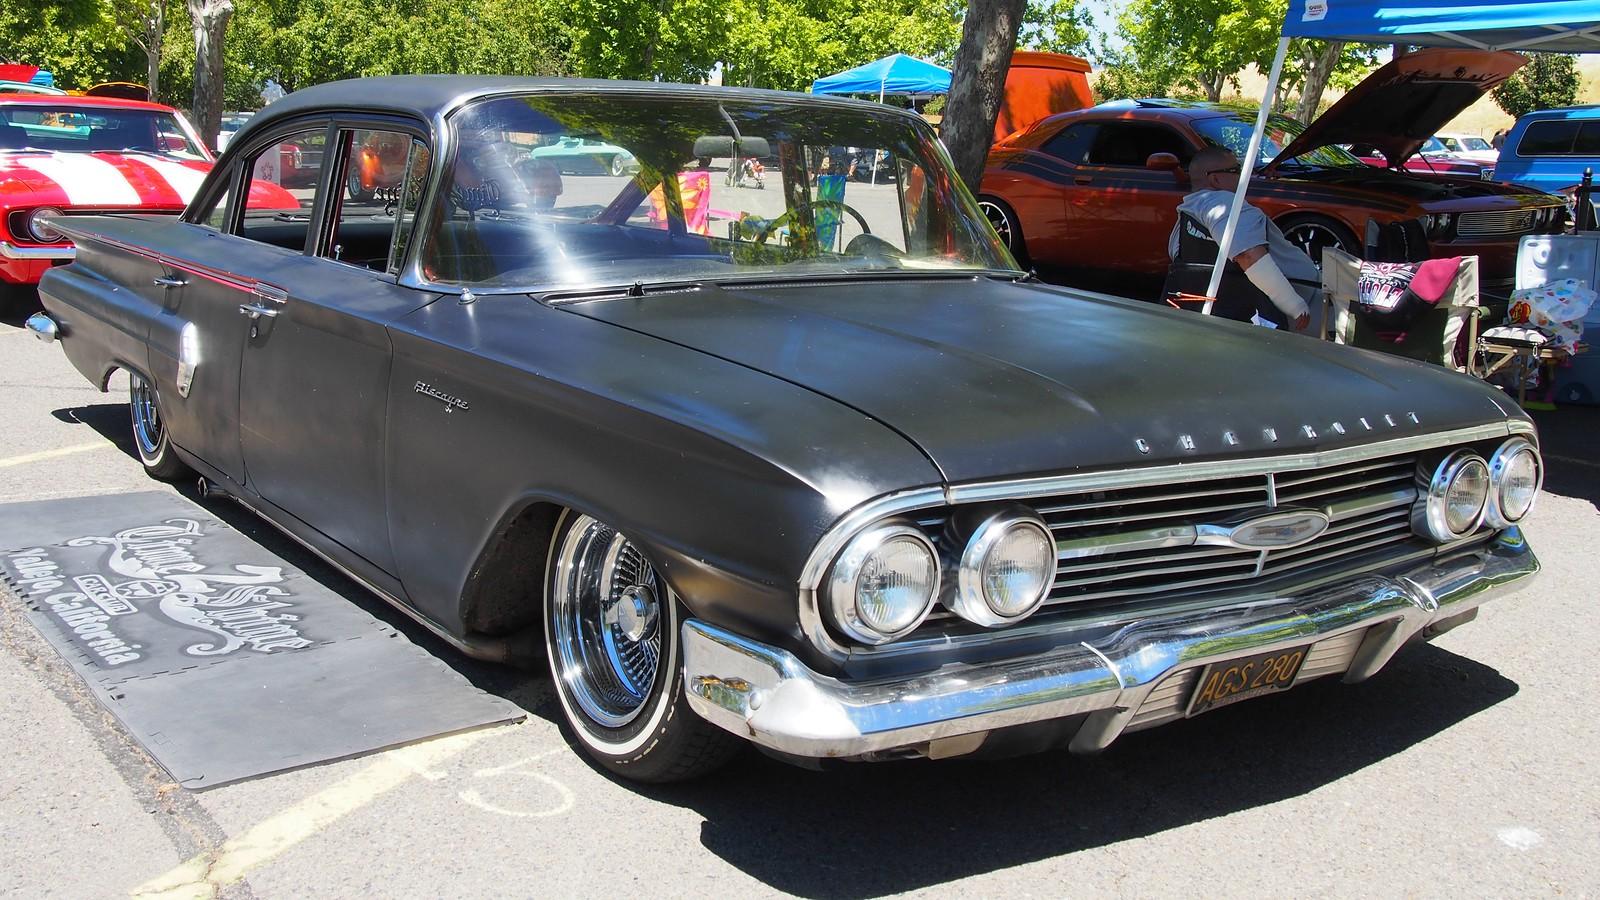 All Chevy 1960 chevrolet biscayne 2 door : Chevrolet 1960 | Flickr